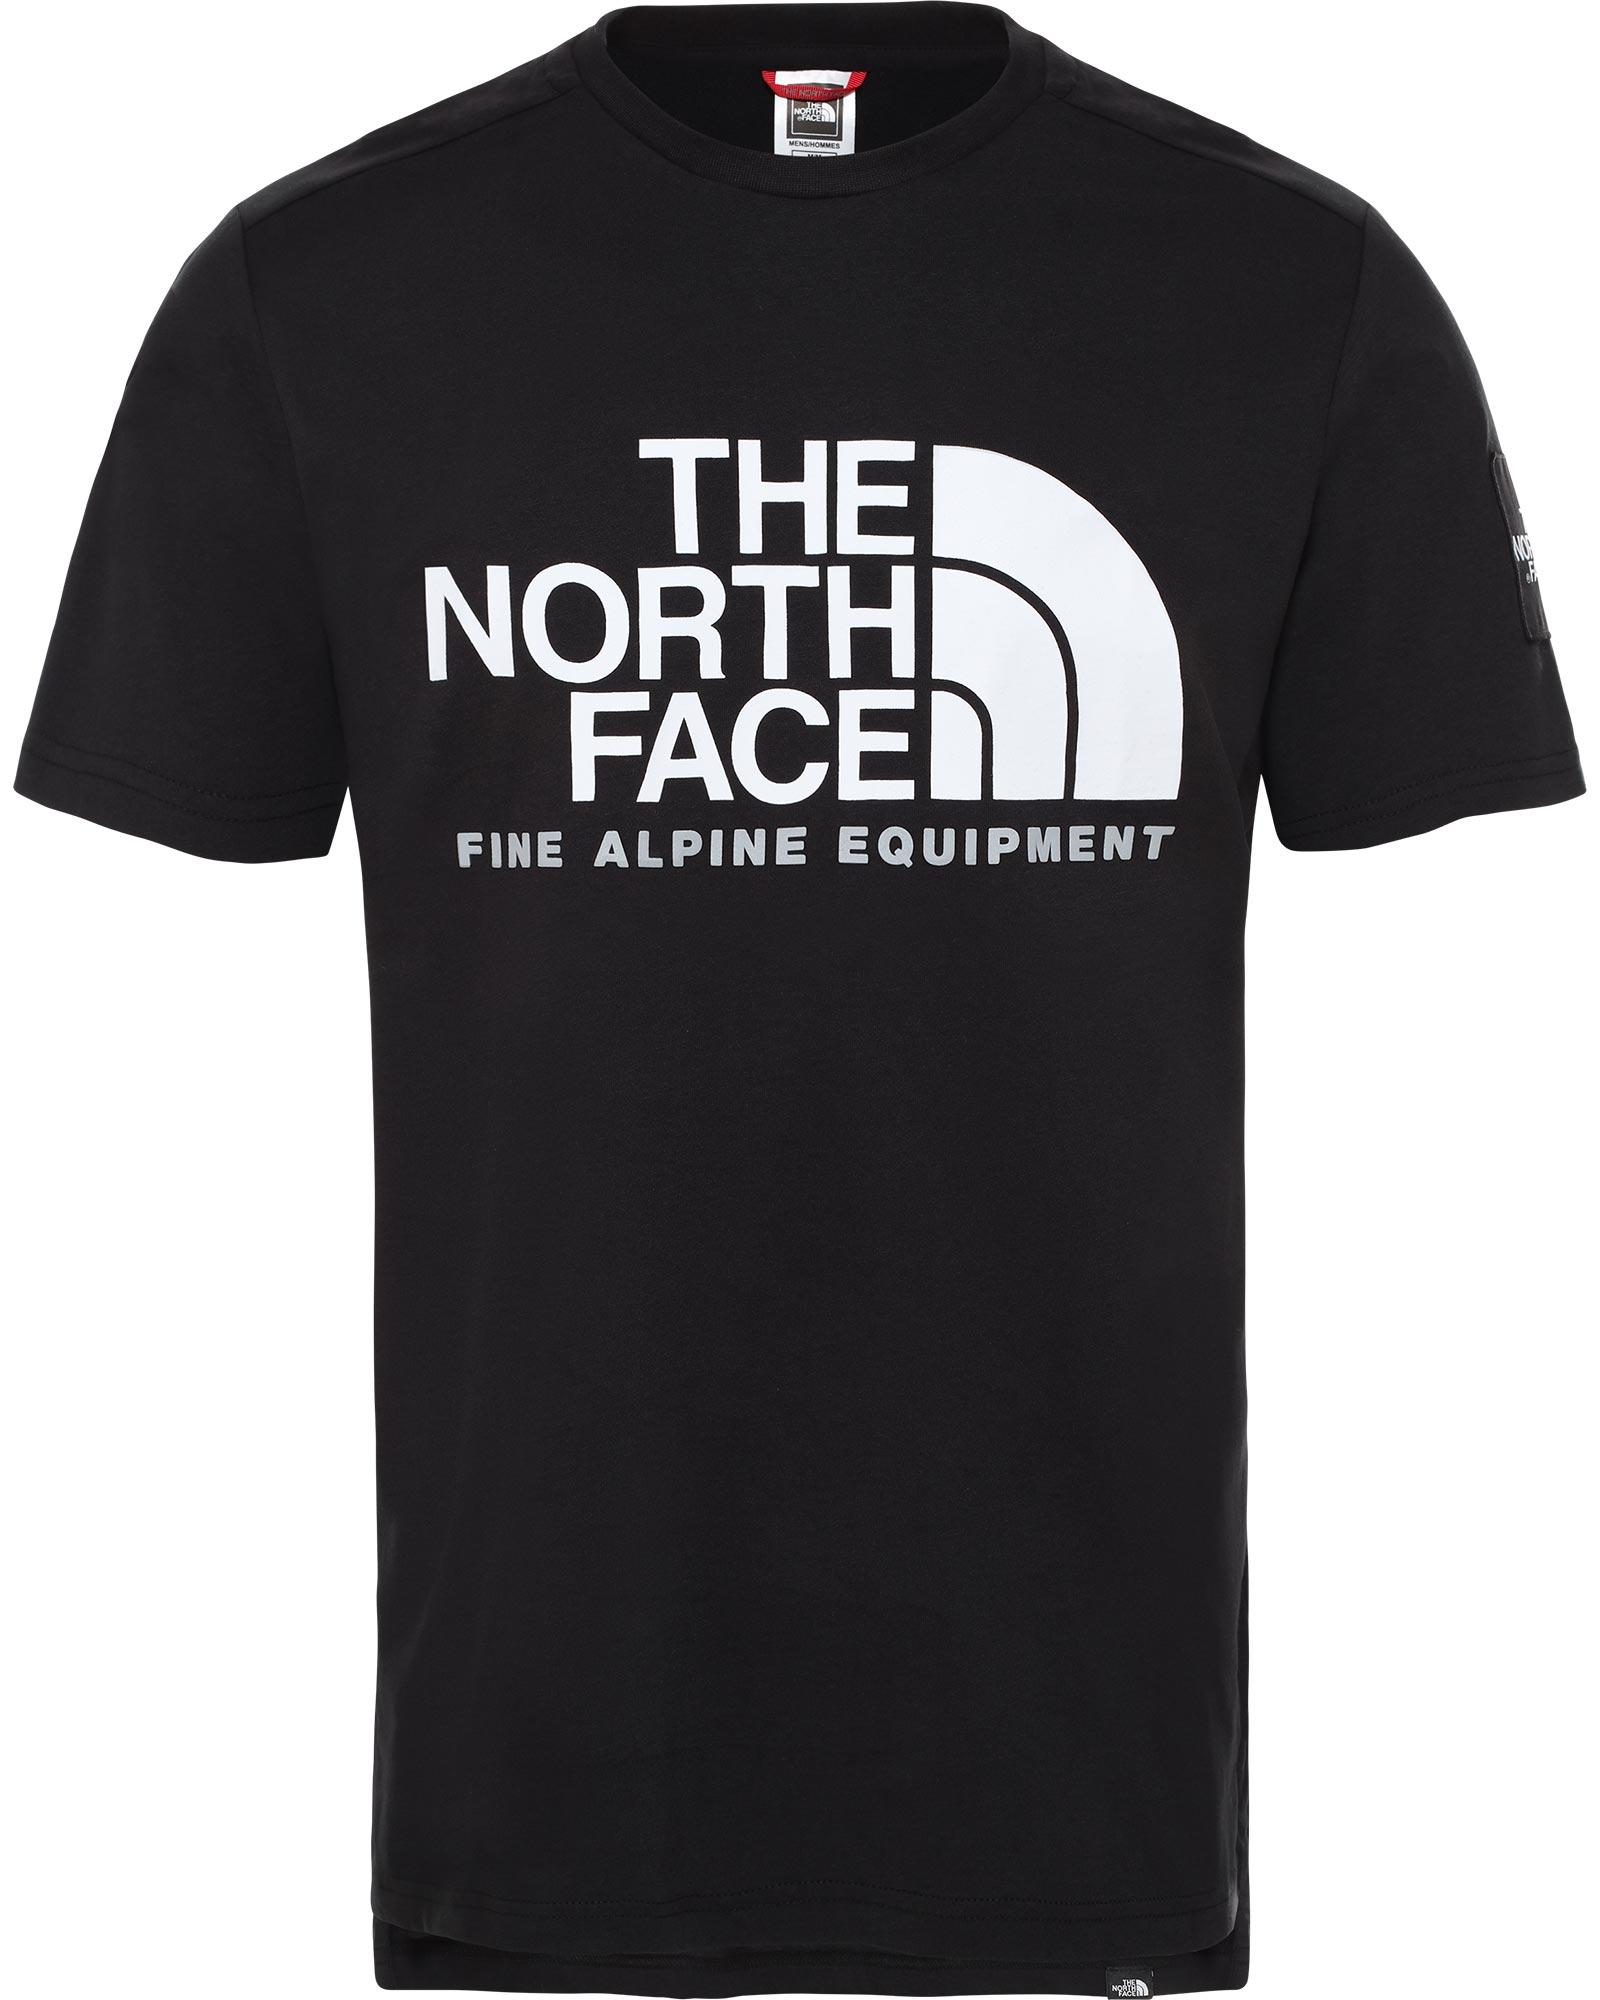 The North Face Fine Alpine Men's T-Shirt 0